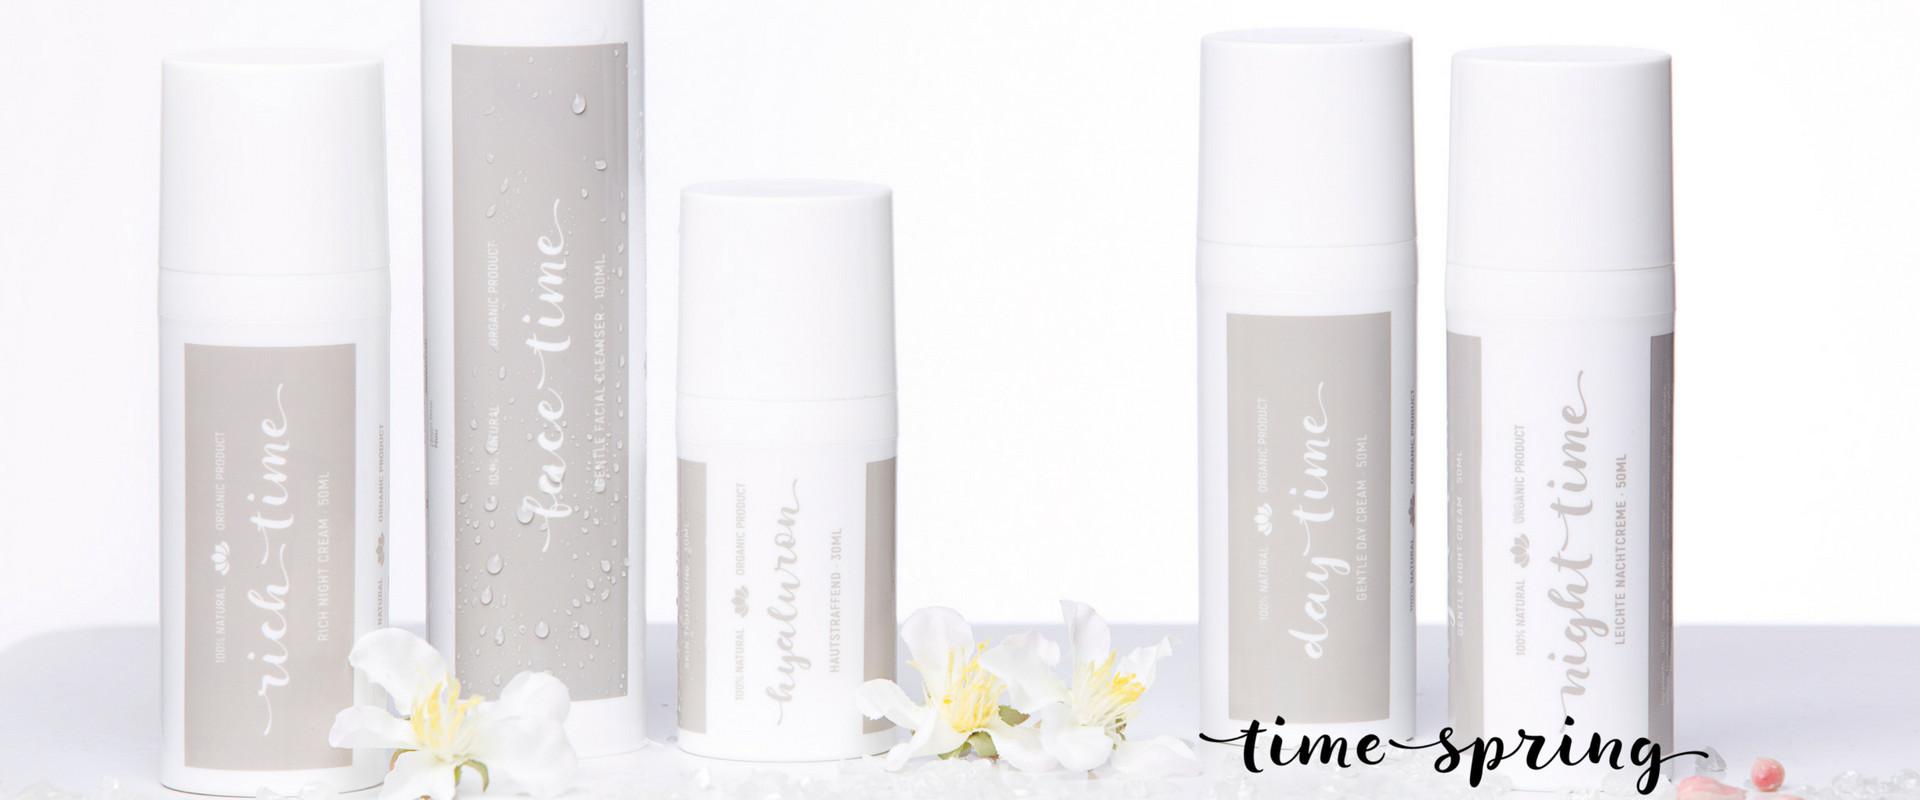 Produkte mit Logo timespring